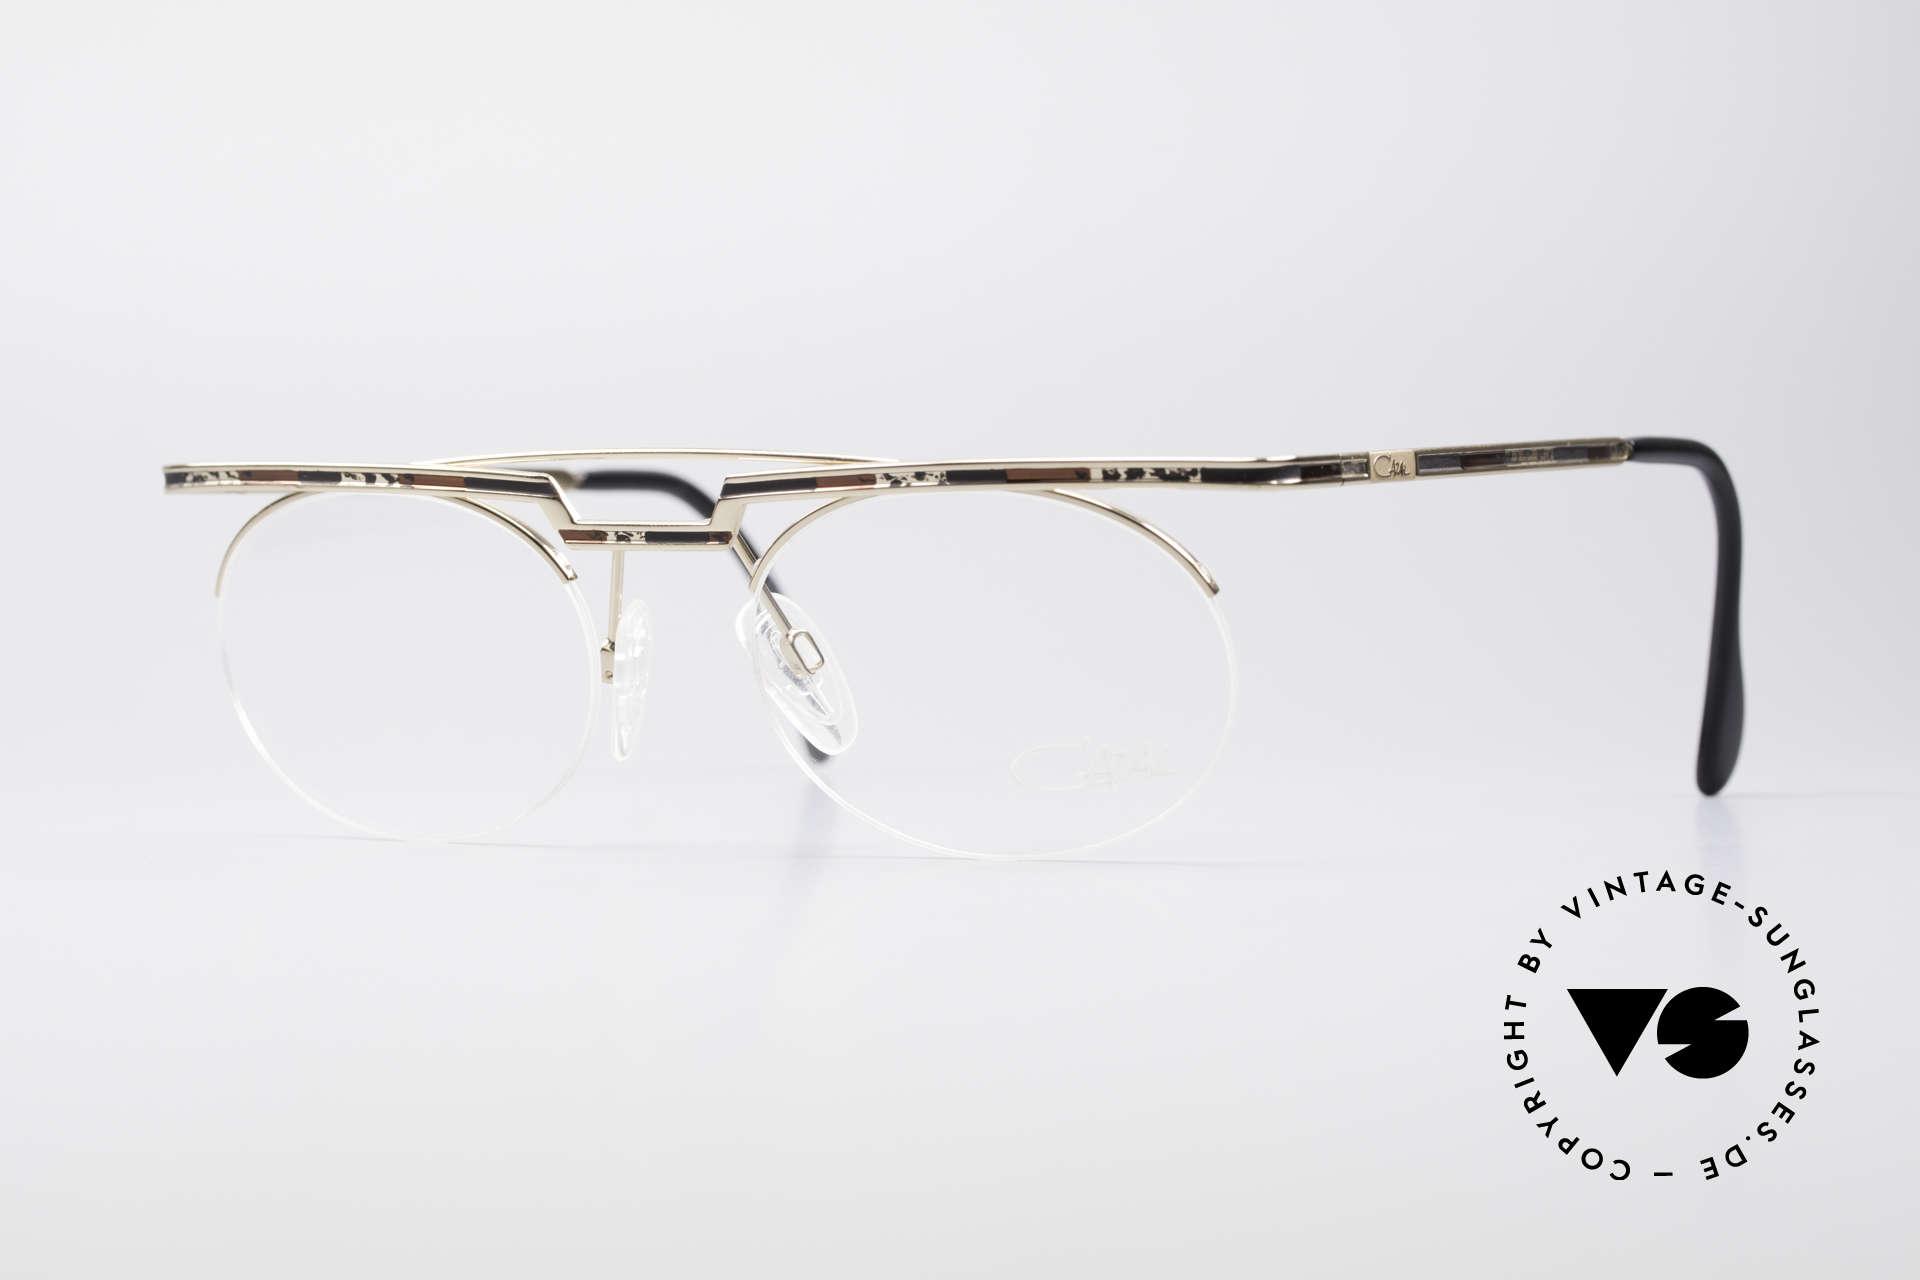 Cazal 758 Original 90s Vintage Glasses, interesting Cazal vintage eyeglasses-frame from 1997/98, Made for Men and Women